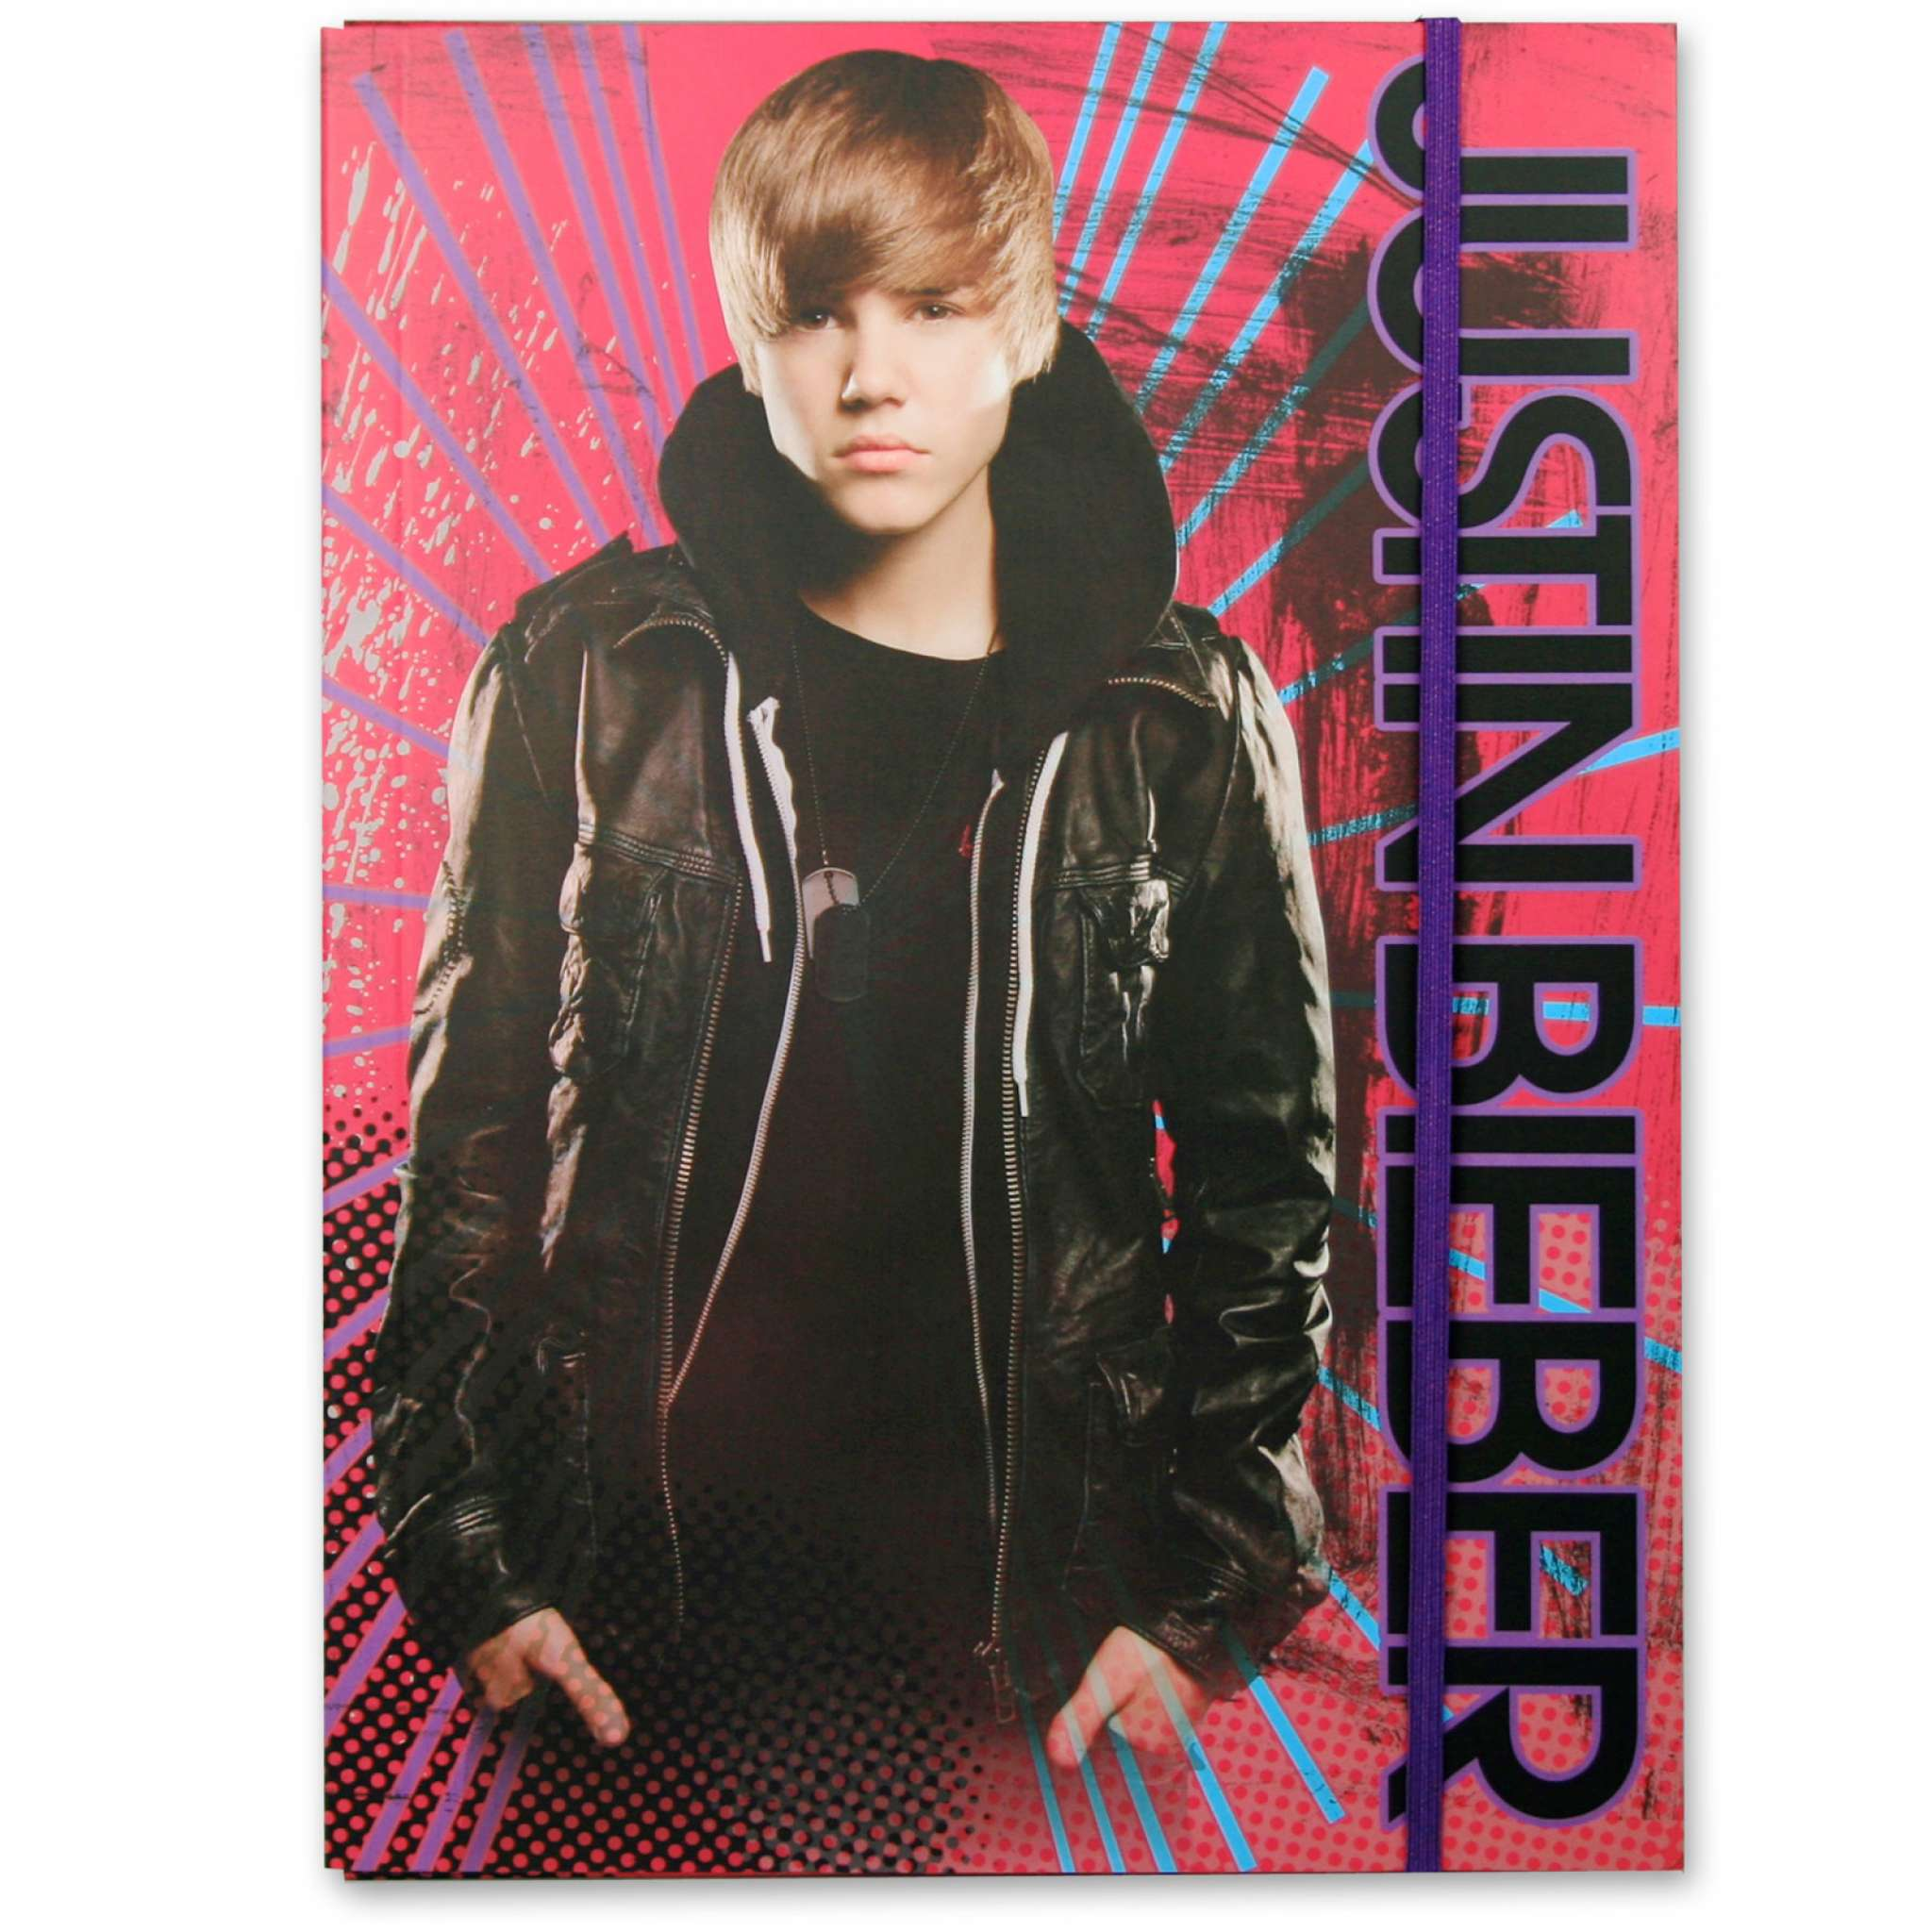 Justin Bieber Strikkmappe